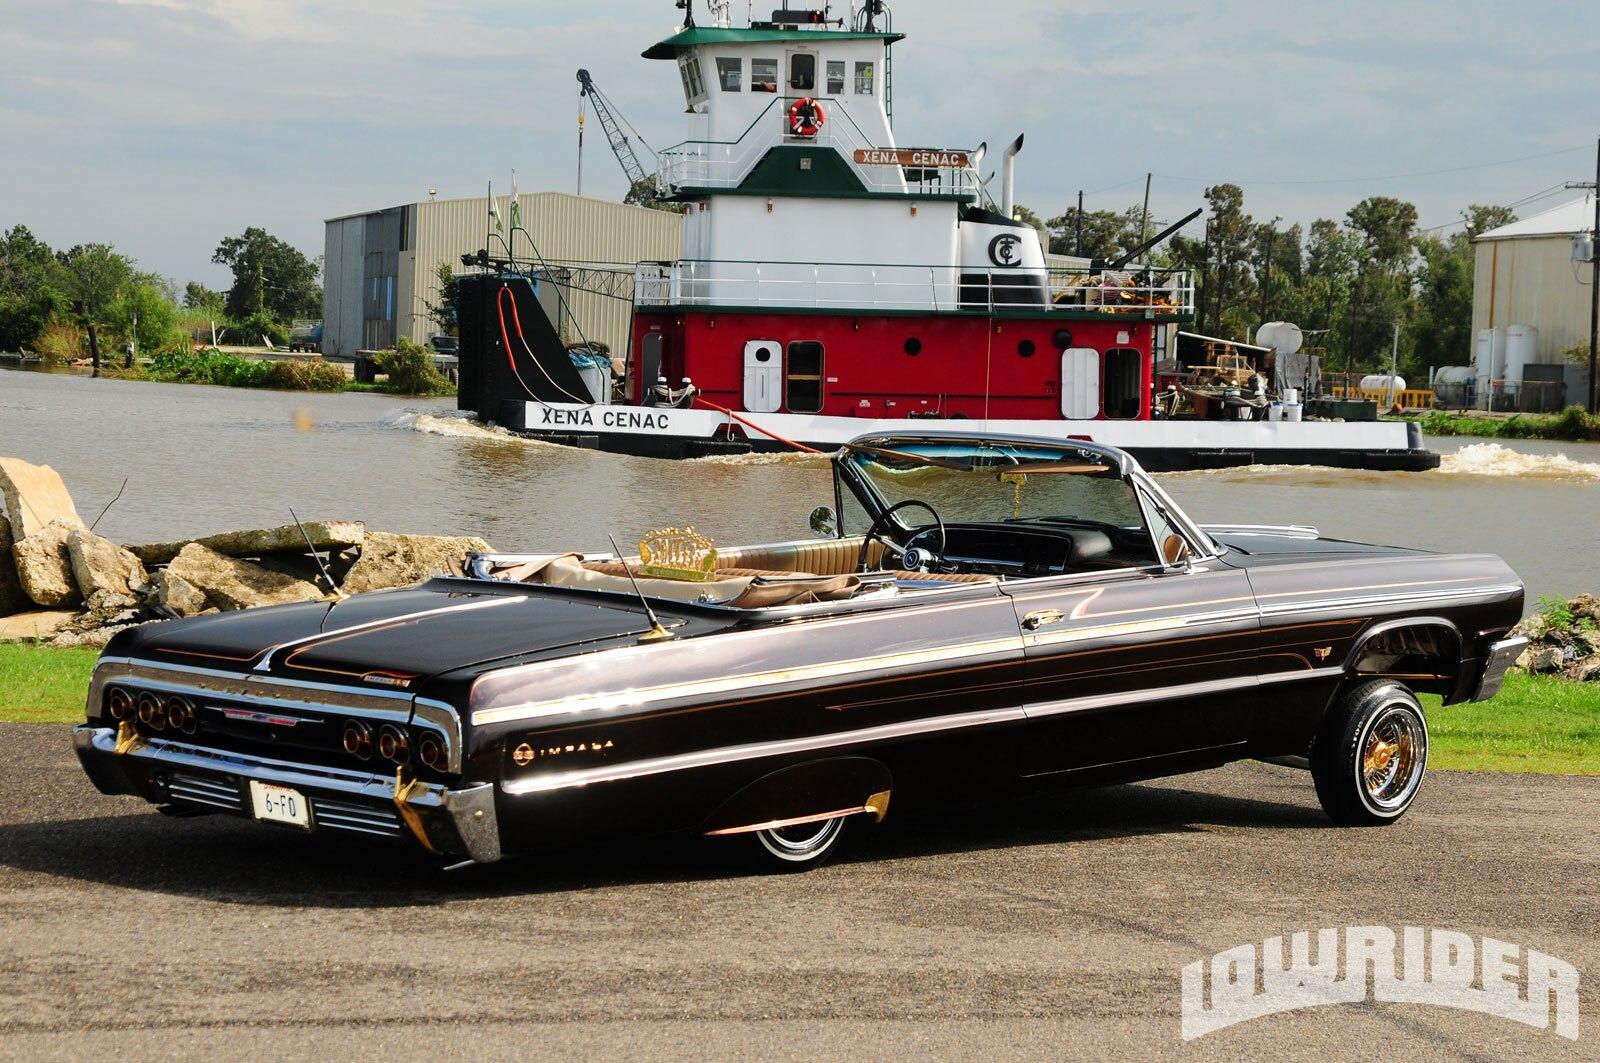 1964 Chevrolet Impala Classics for Sale - Classics on Autotrader